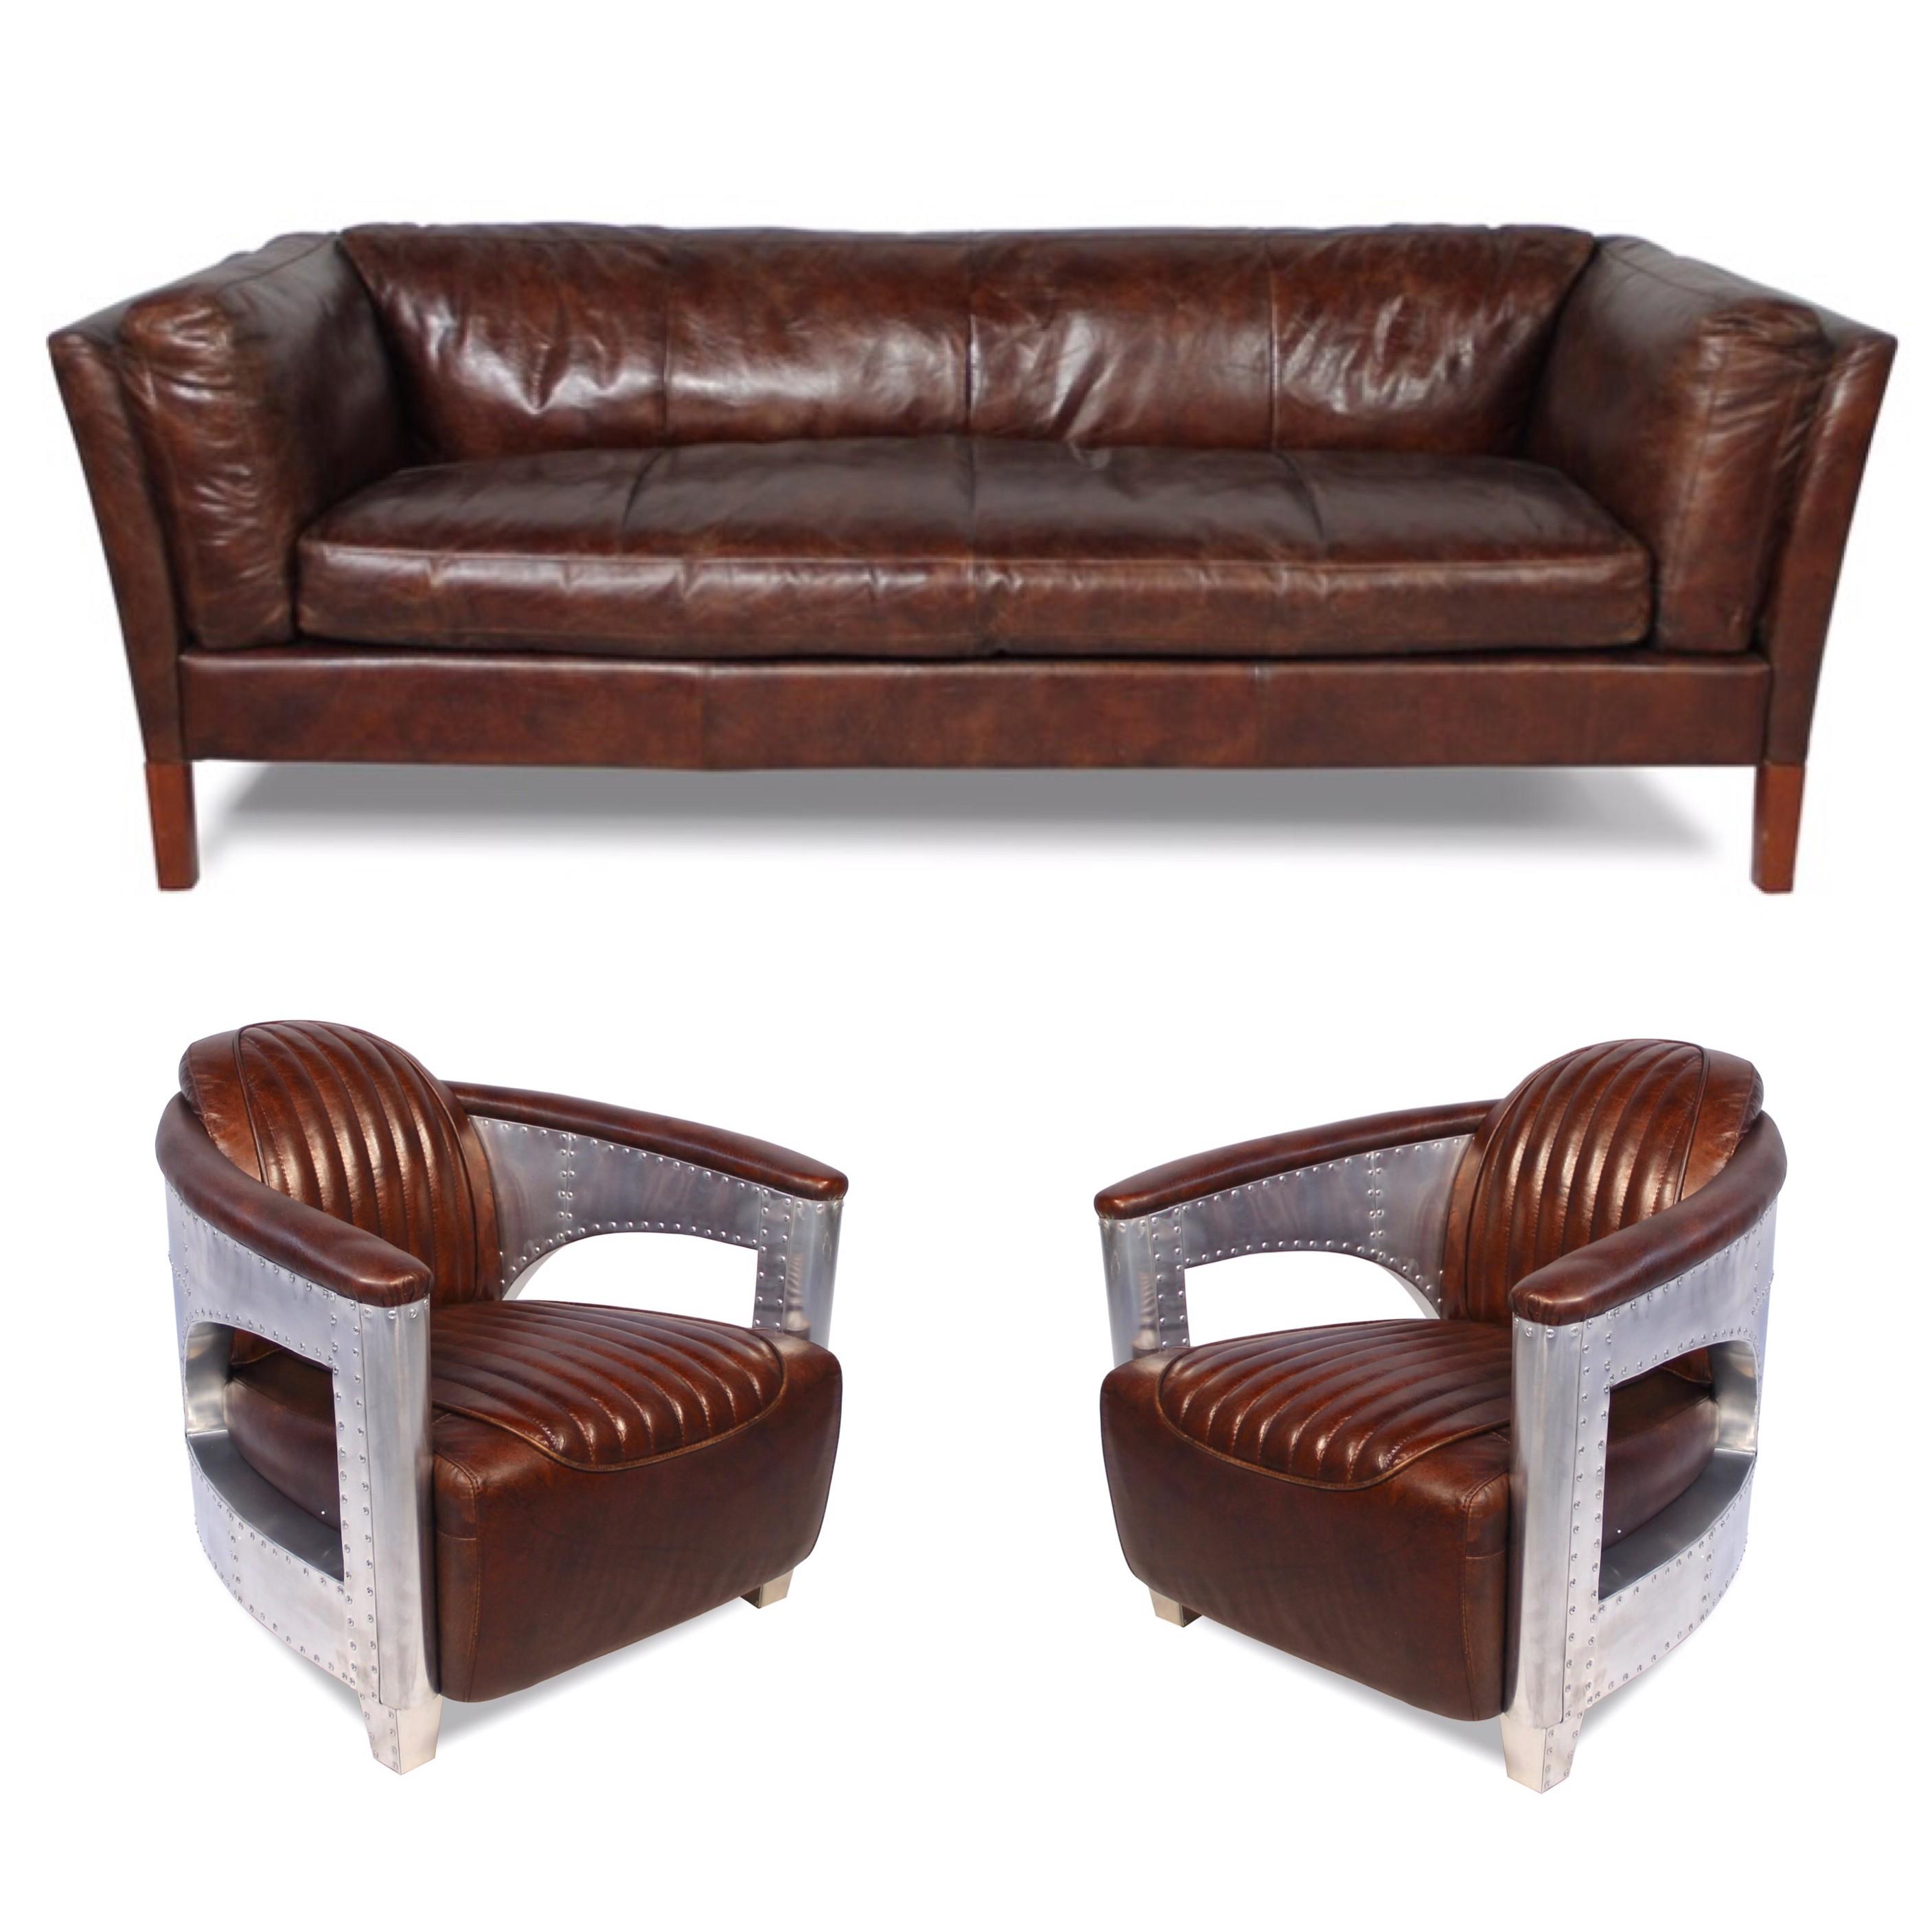 canap cuir marron vieilli avec 2 fauteuils aviateur cuir marron. Black Bedroom Furniture Sets. Home Design Ideas